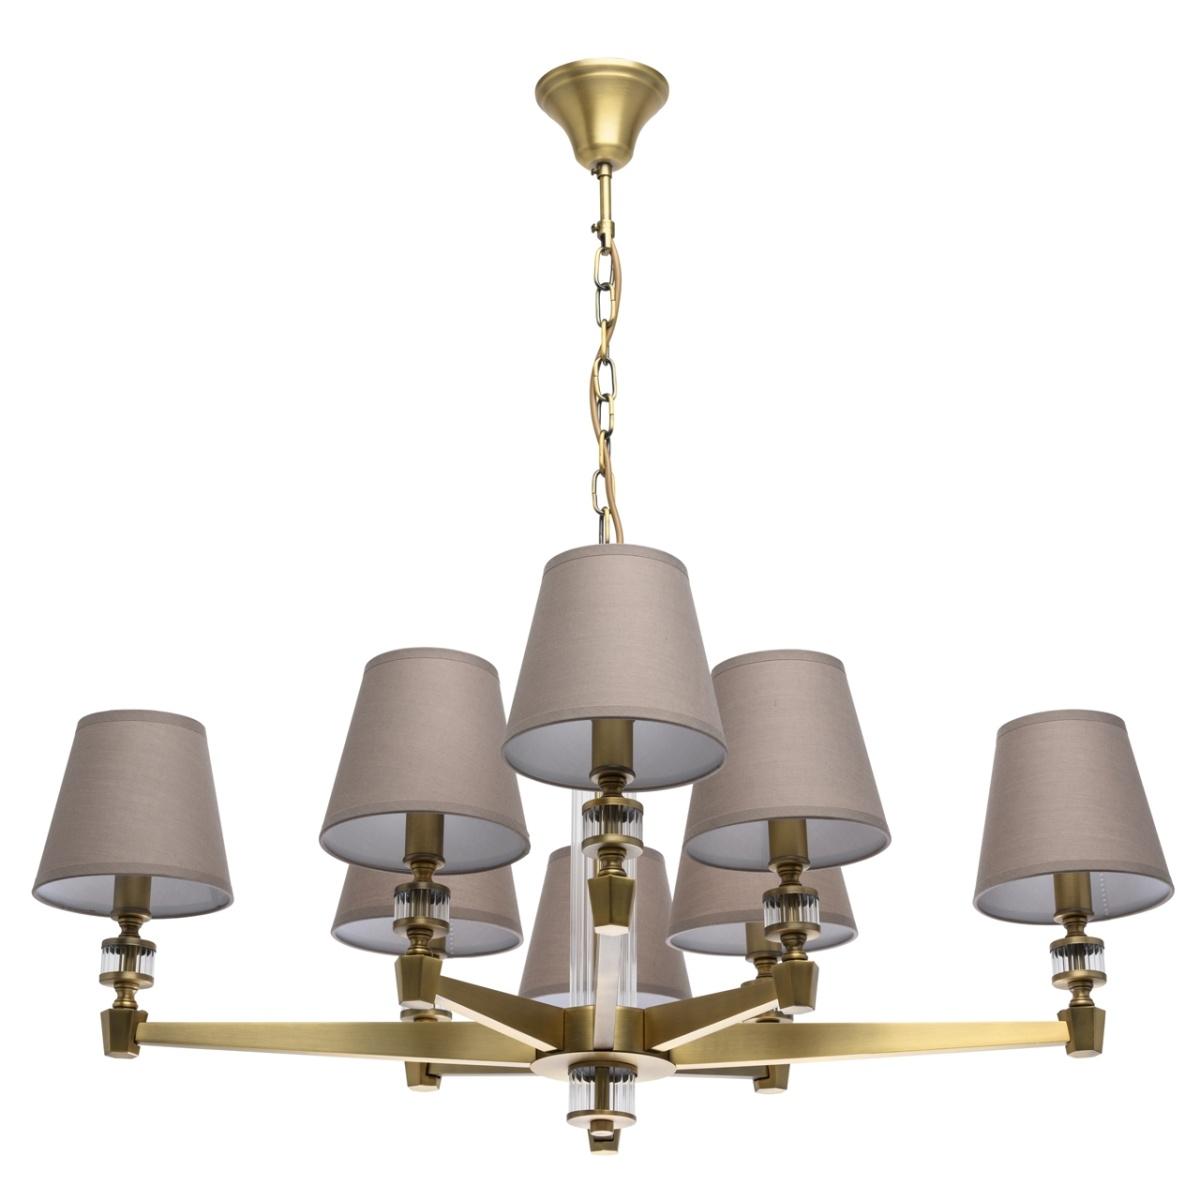 Candelabru Light Classic Delrey Imagine